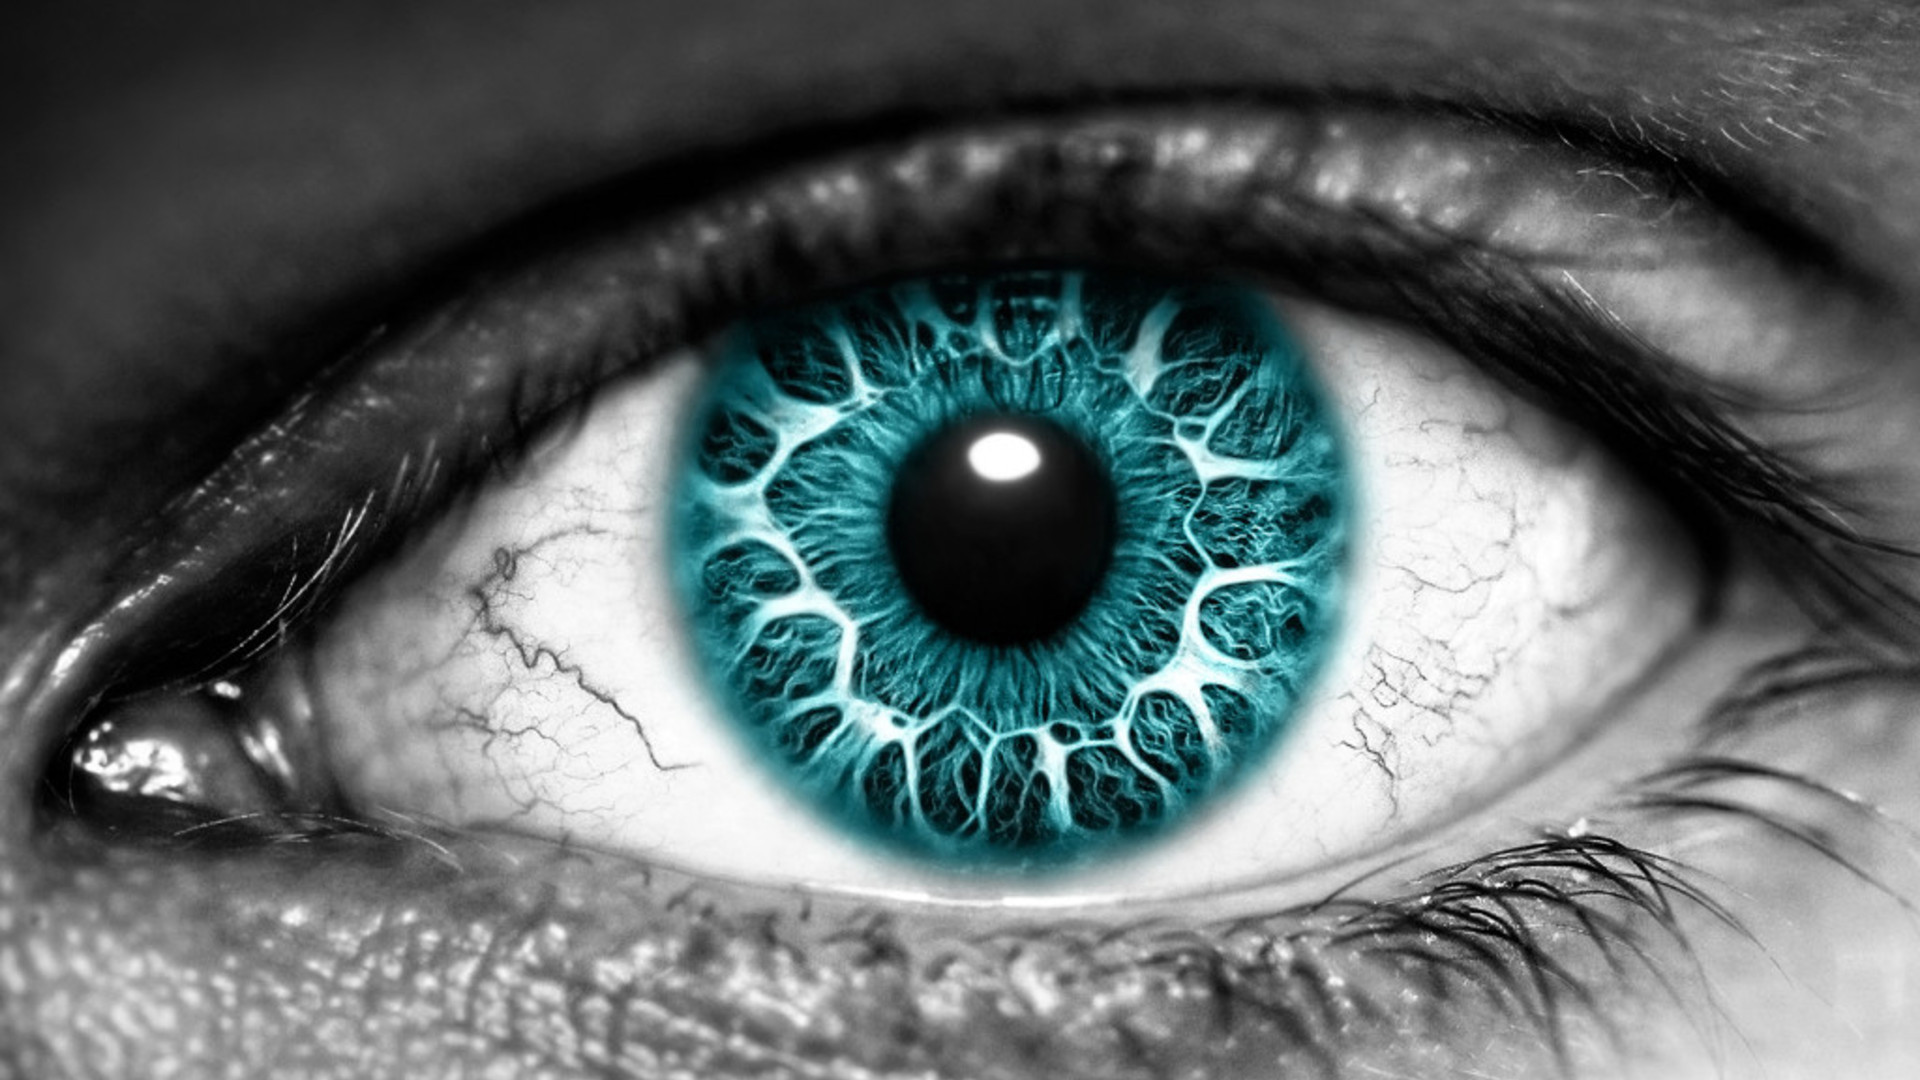 Abstract Eye - 1920x1080